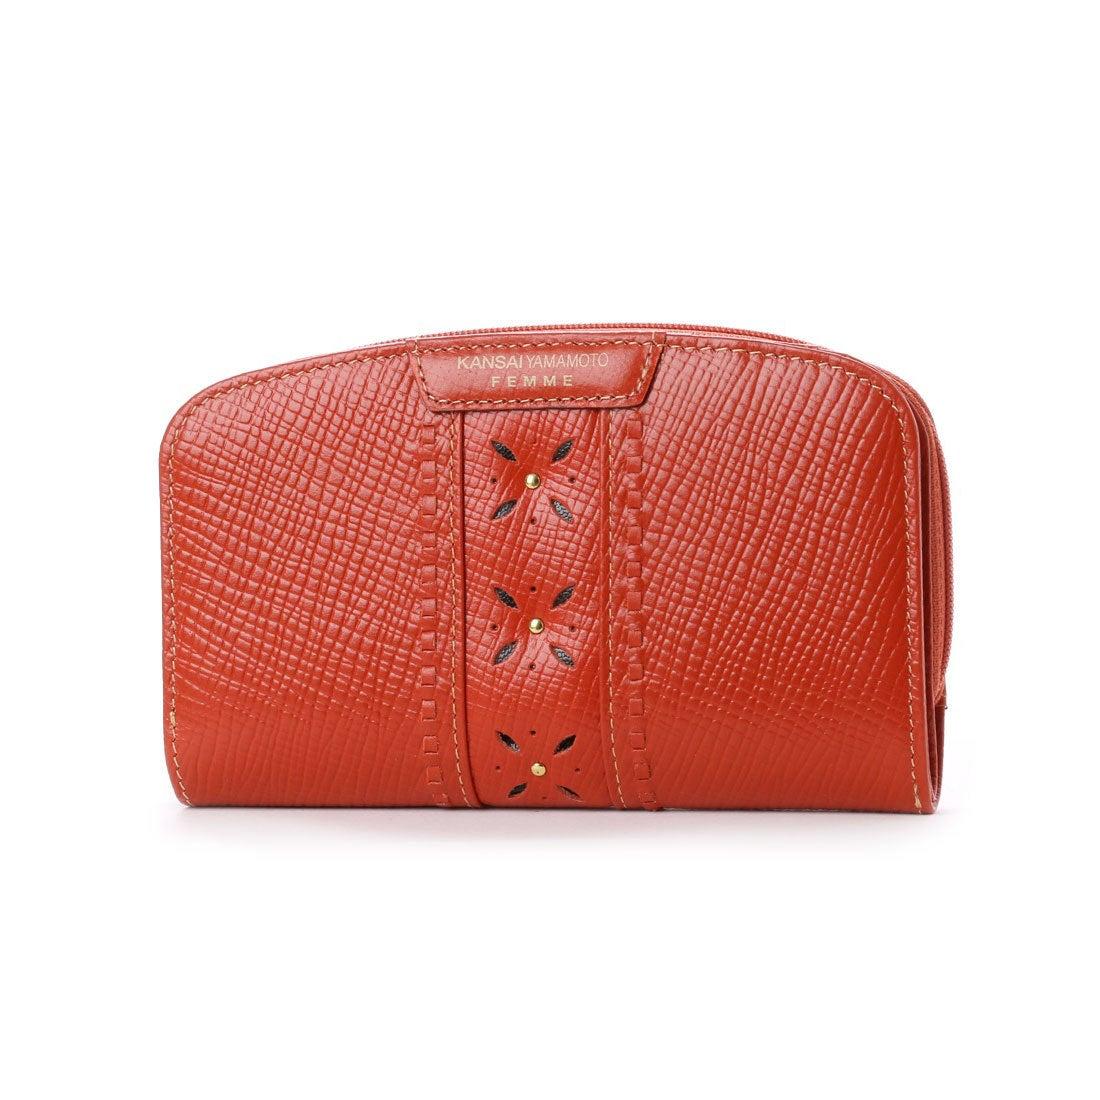 ce95fea57aa0 カンサイ ヤマモト ファム KANSAI YAMAMOTO FEMME ラウンドファスナー2つ折財布 (オレンジ) -靴&ファッション通販  ロコンド〜自宅で試着、気軽に返品